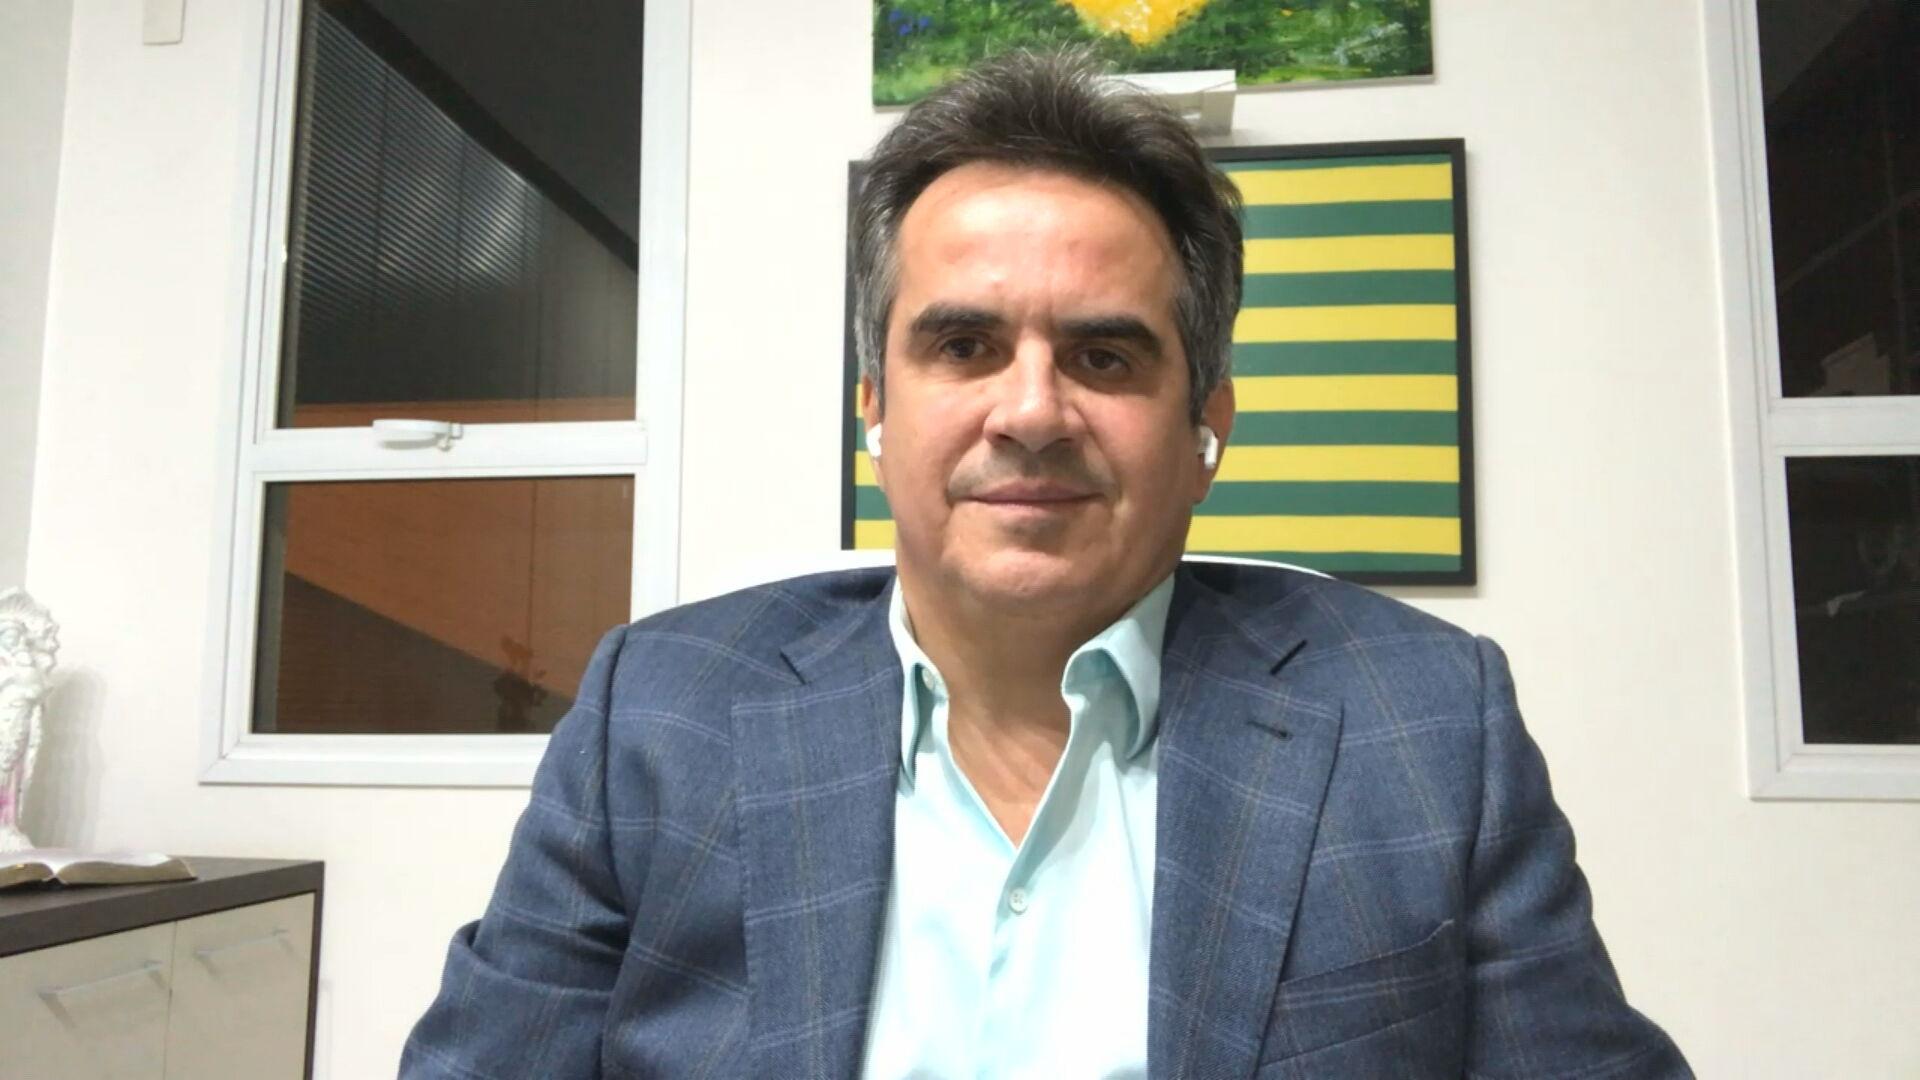 O senador Ciro Nogueira (PP-PI) conversou com a CNN sobre a CPI da Pandemia